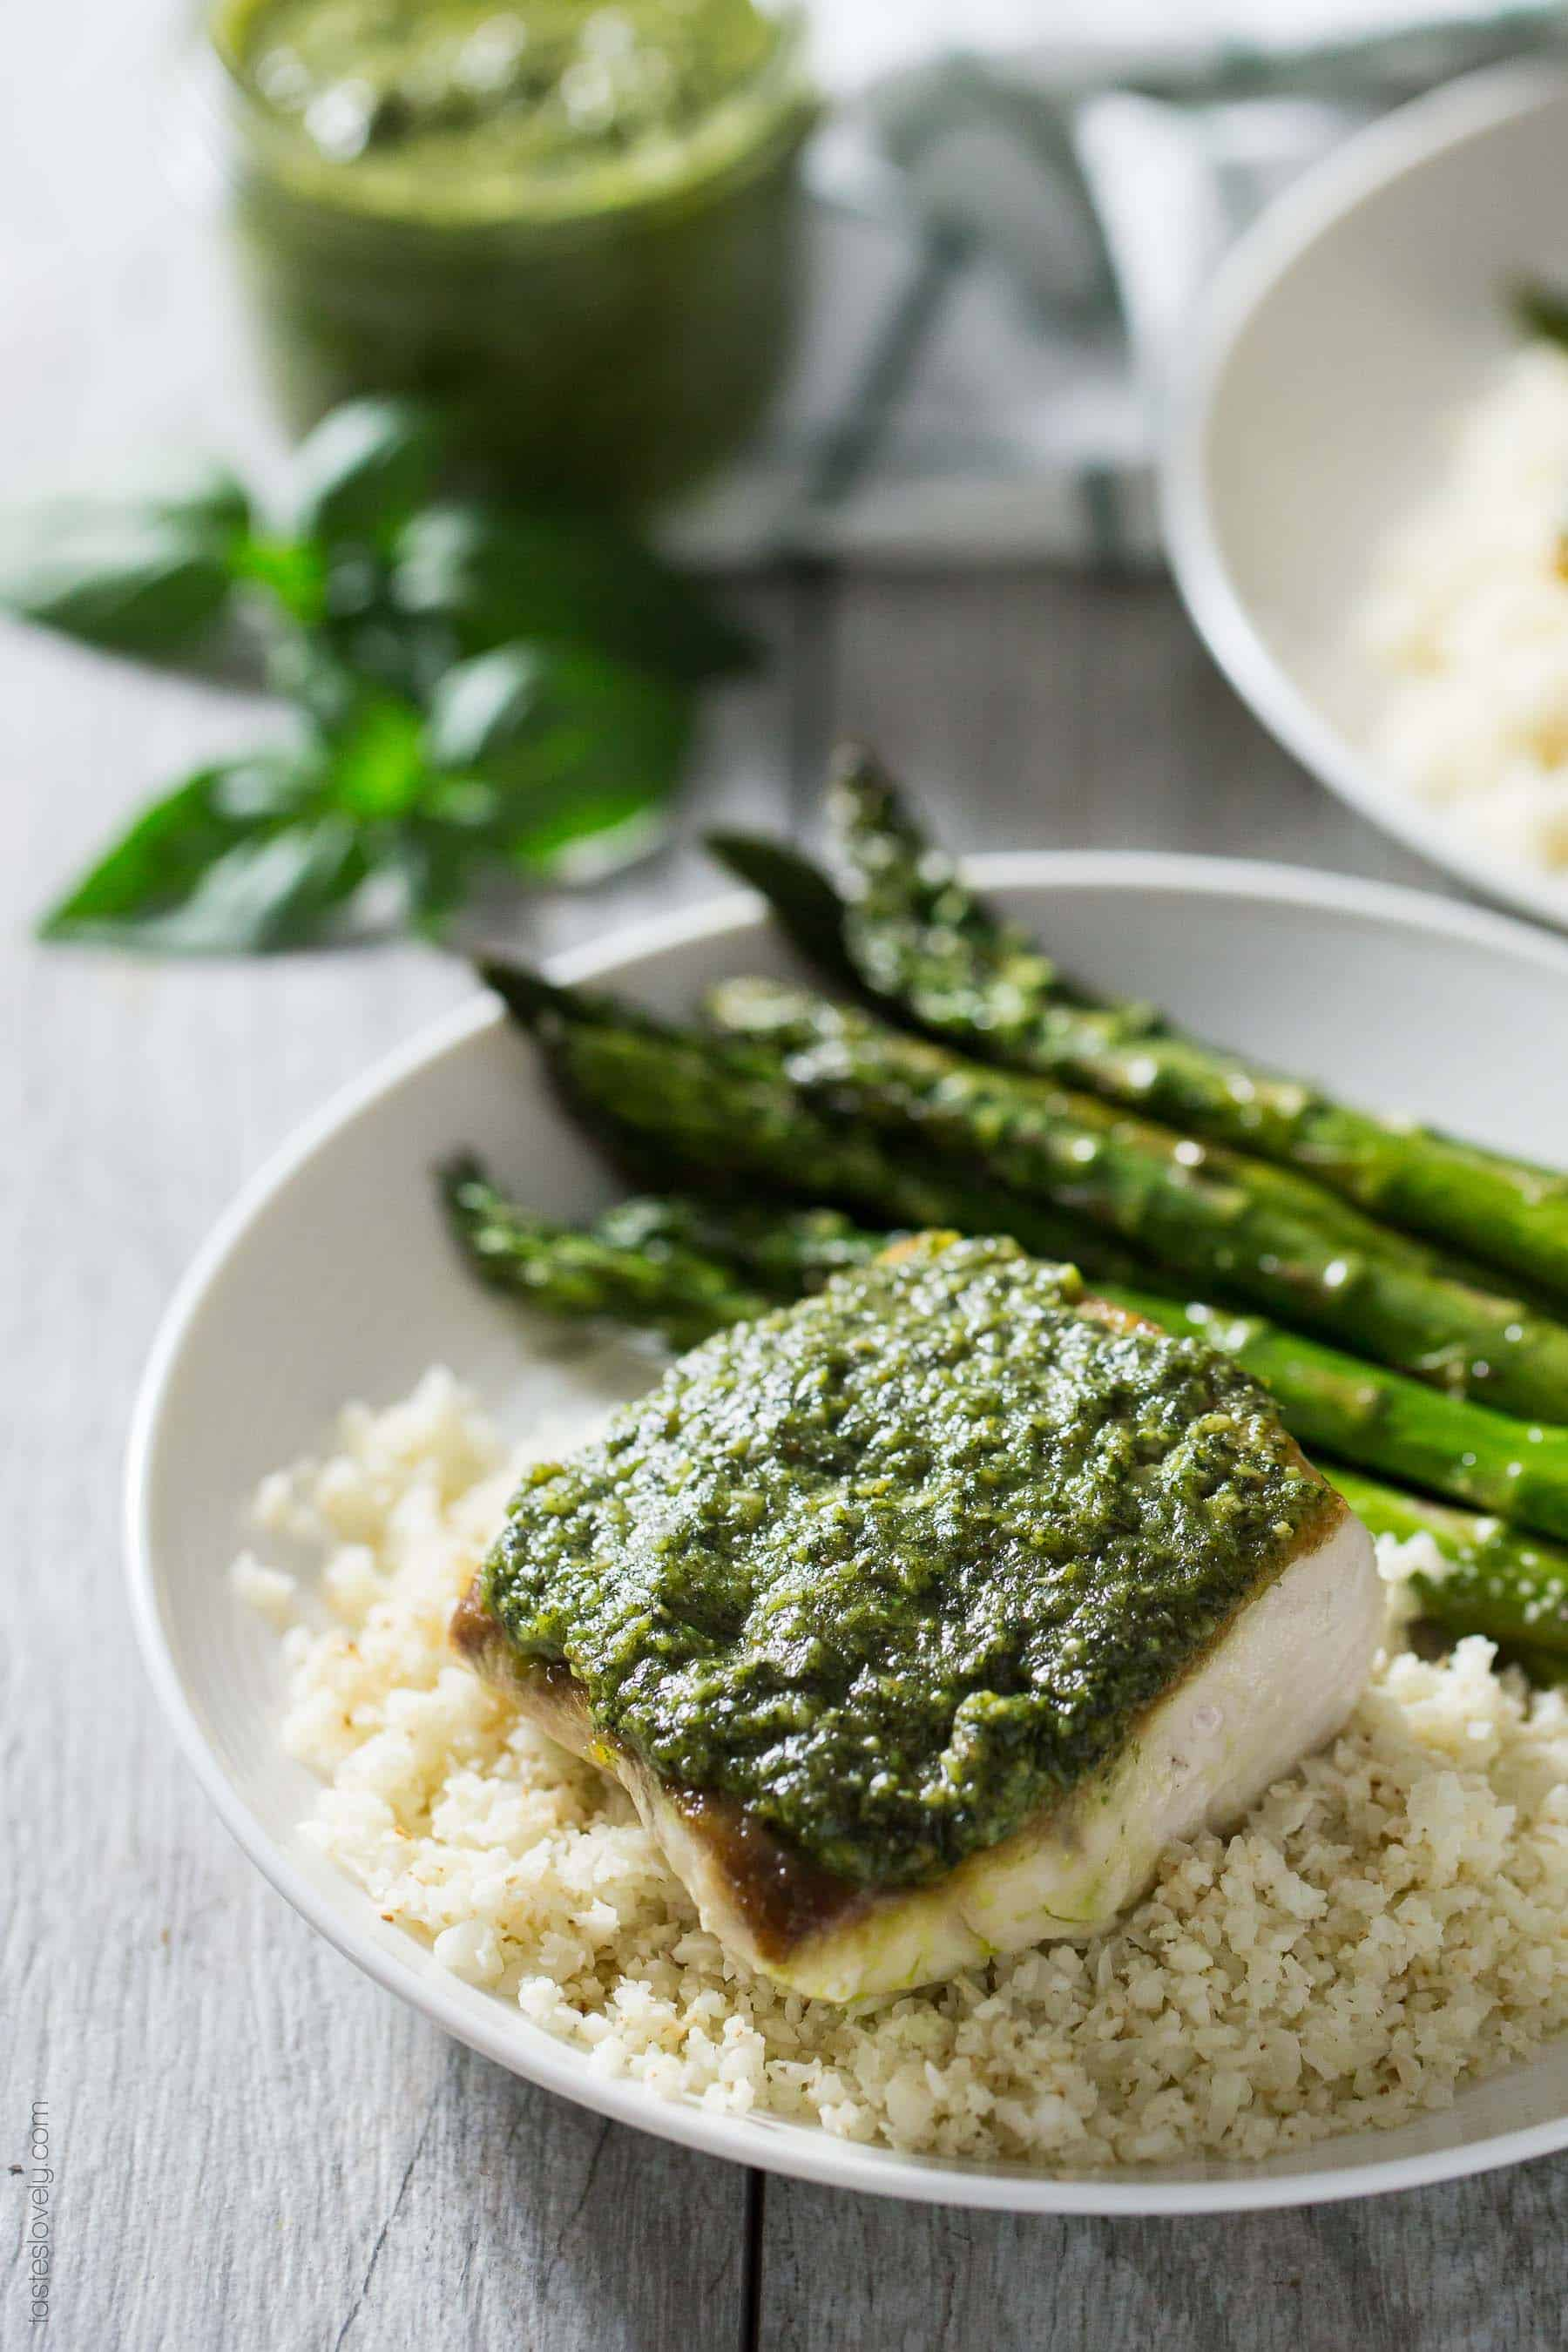 Pesto Mahi Mahi - a simple and fresh fish dinner recipe that is paleo, gluten free, Whole30 and dairy free!